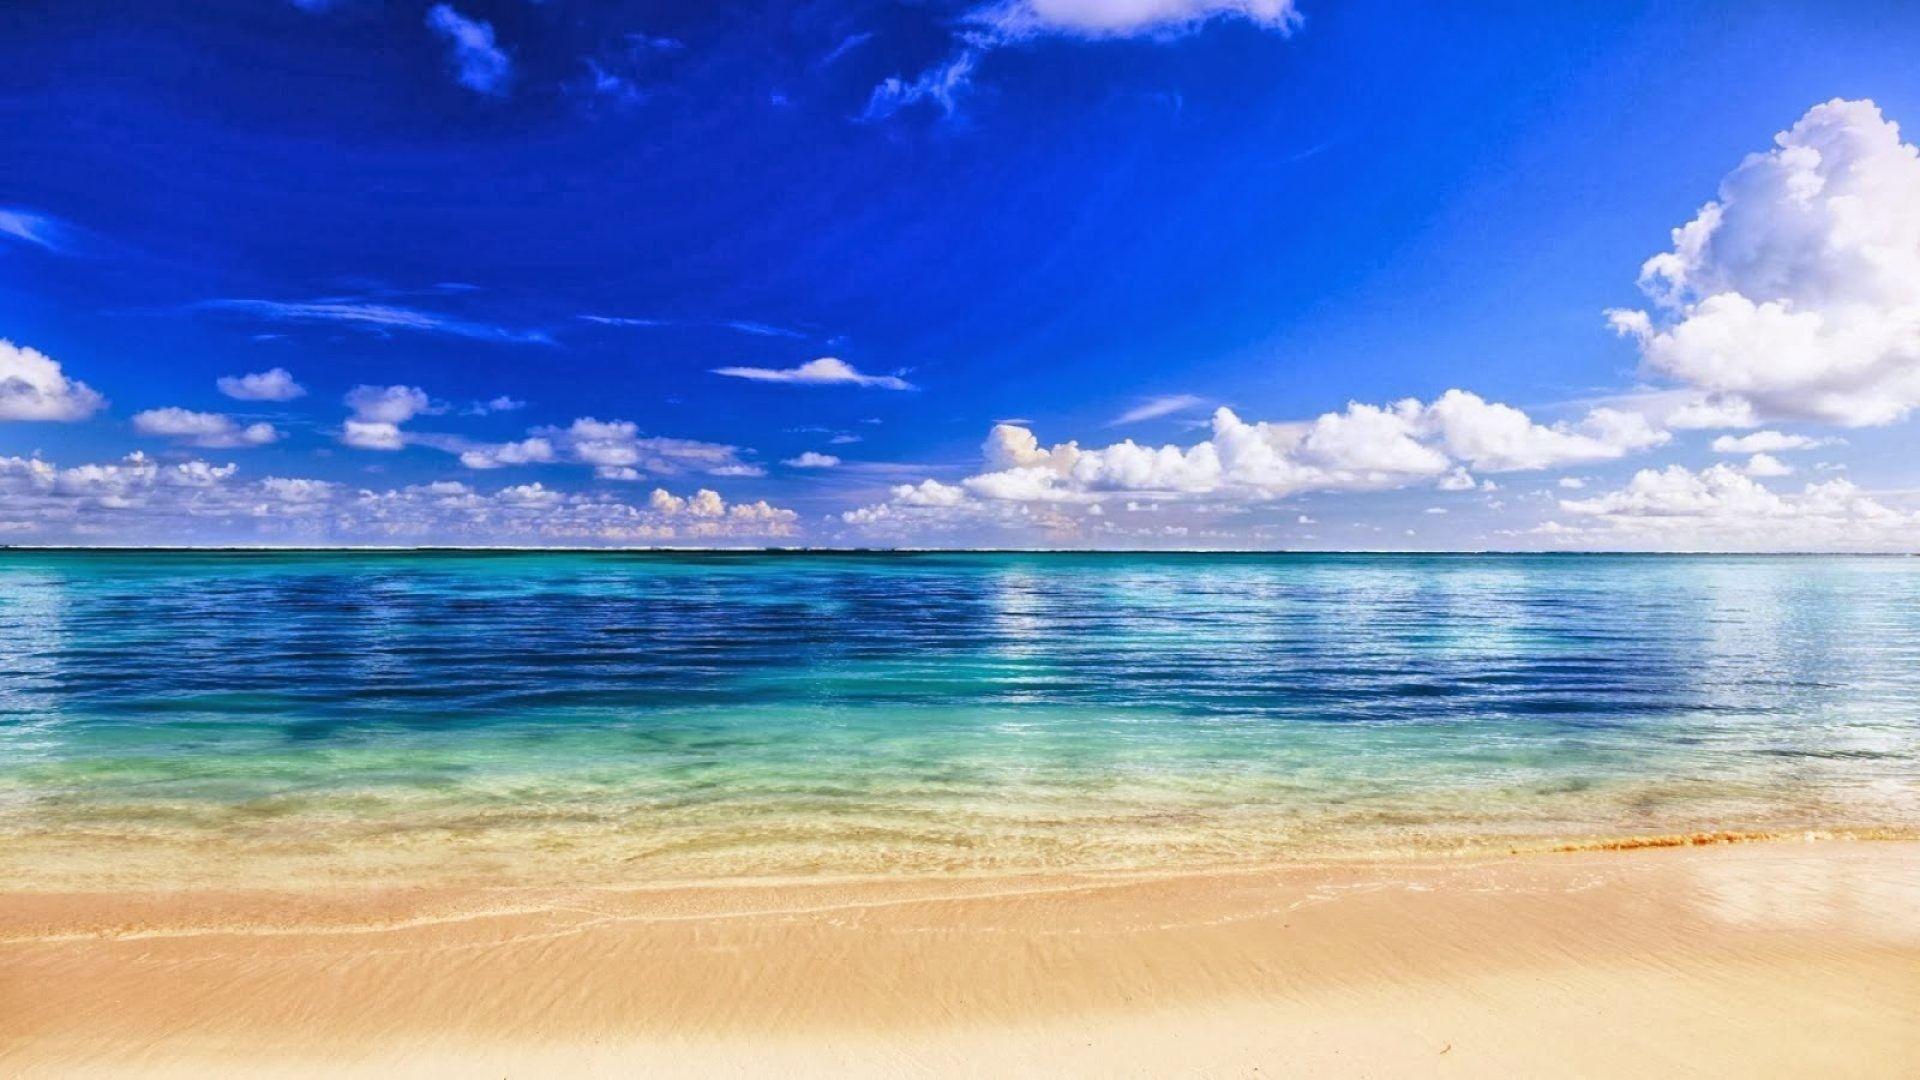 Ocean Themed HD Desktop Wallpaper